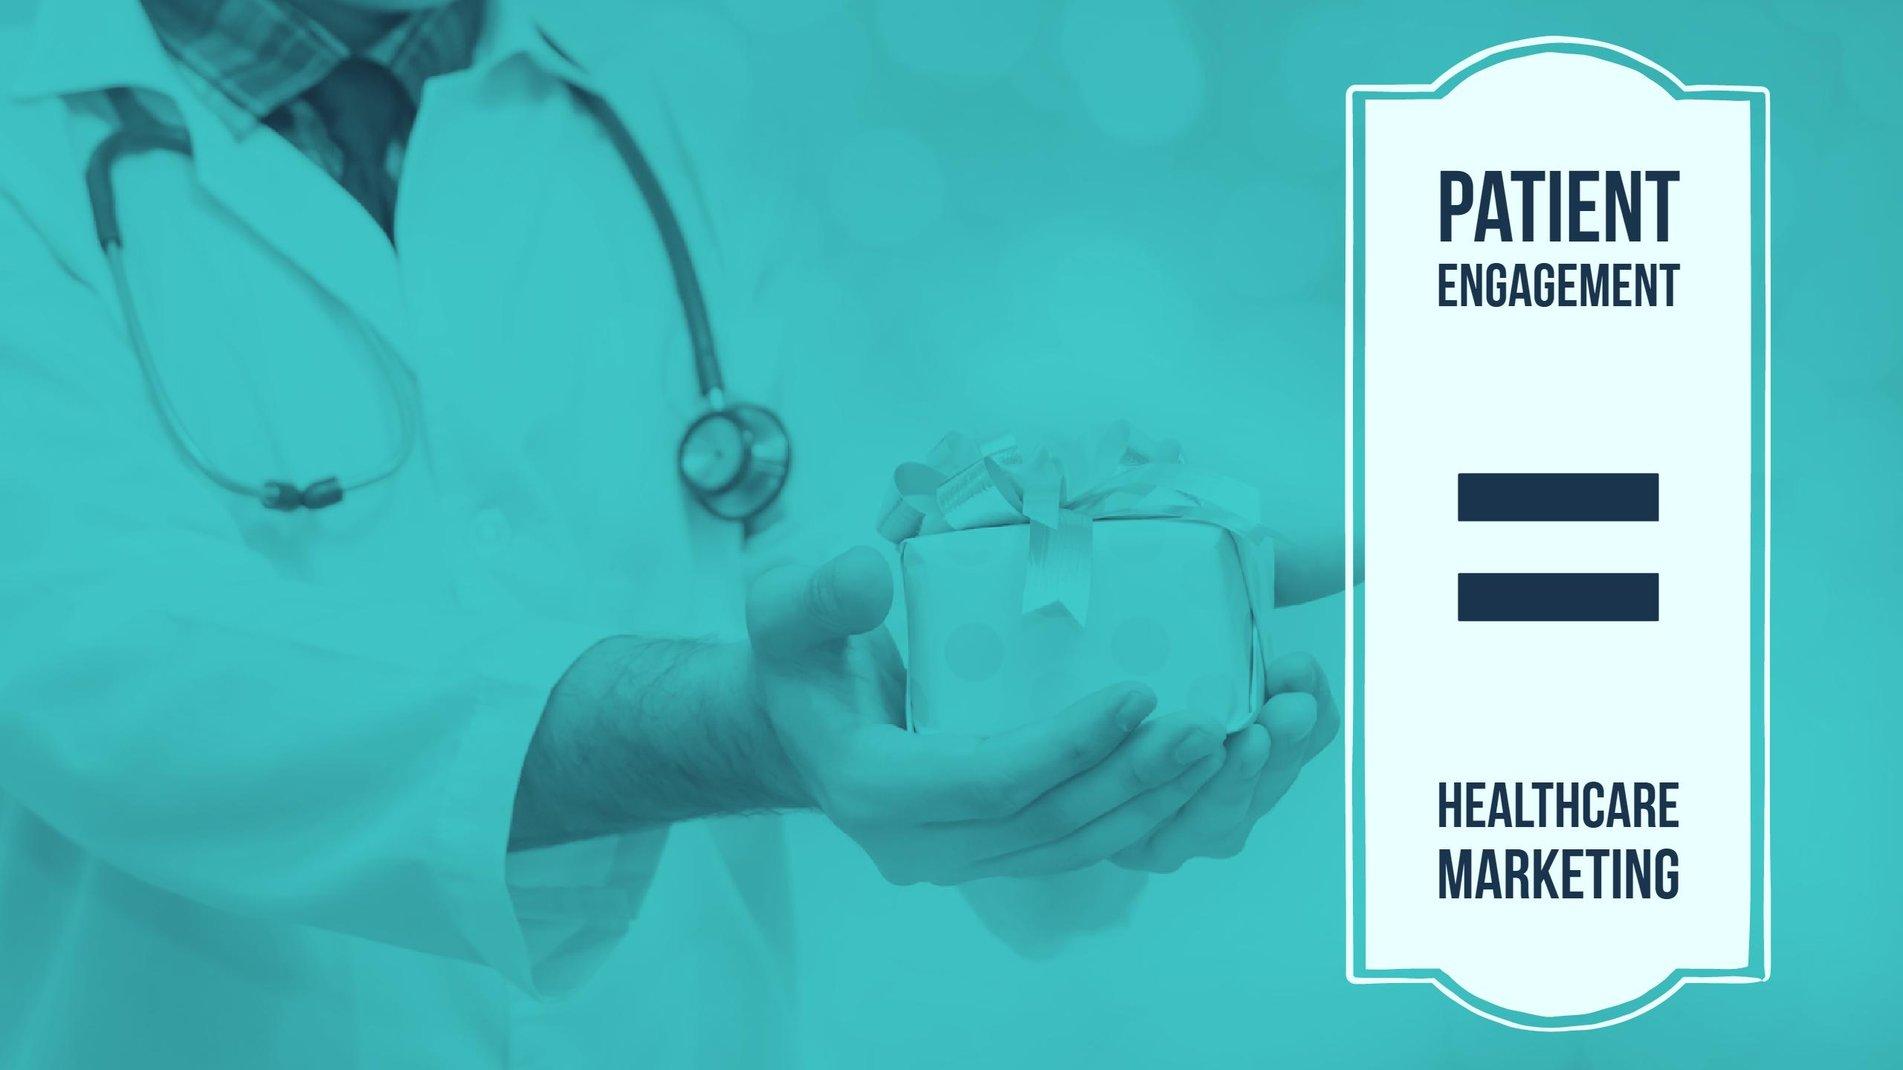 How Patient Engagement Communications Can Improve Healthcare Provider Revenues